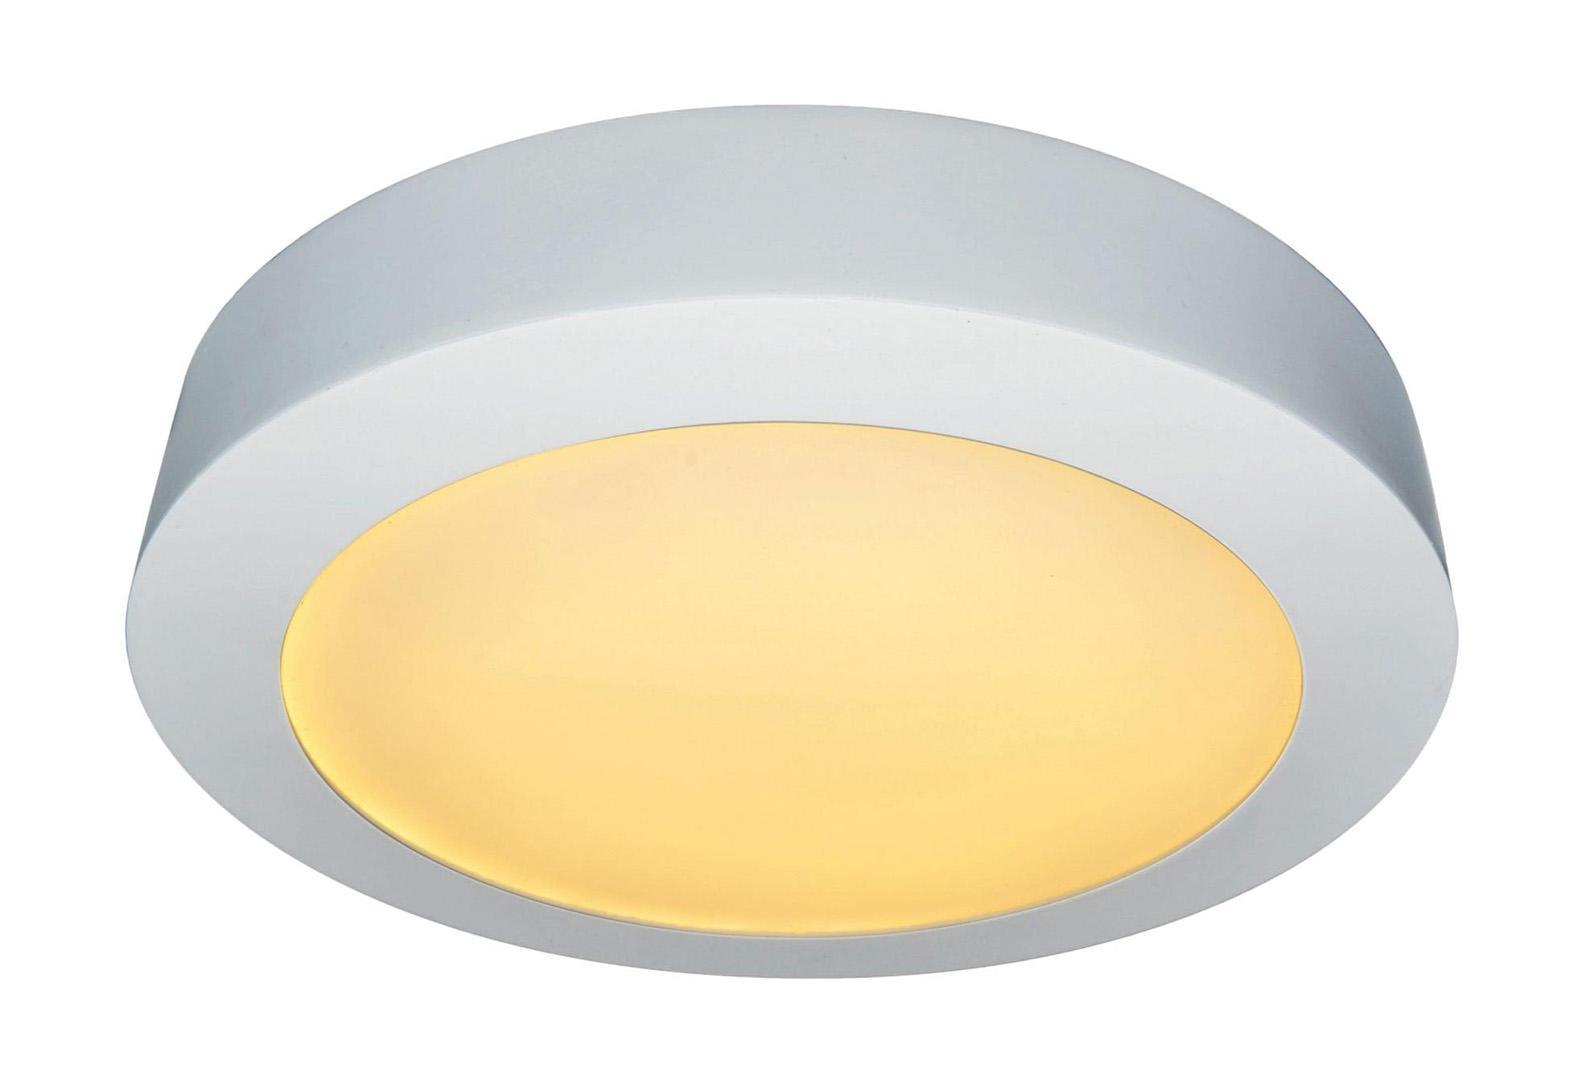 A3018PL-1WH ANGOLO Встраиваемый светильникA3018PL-1WH18W LED; 1440 lm